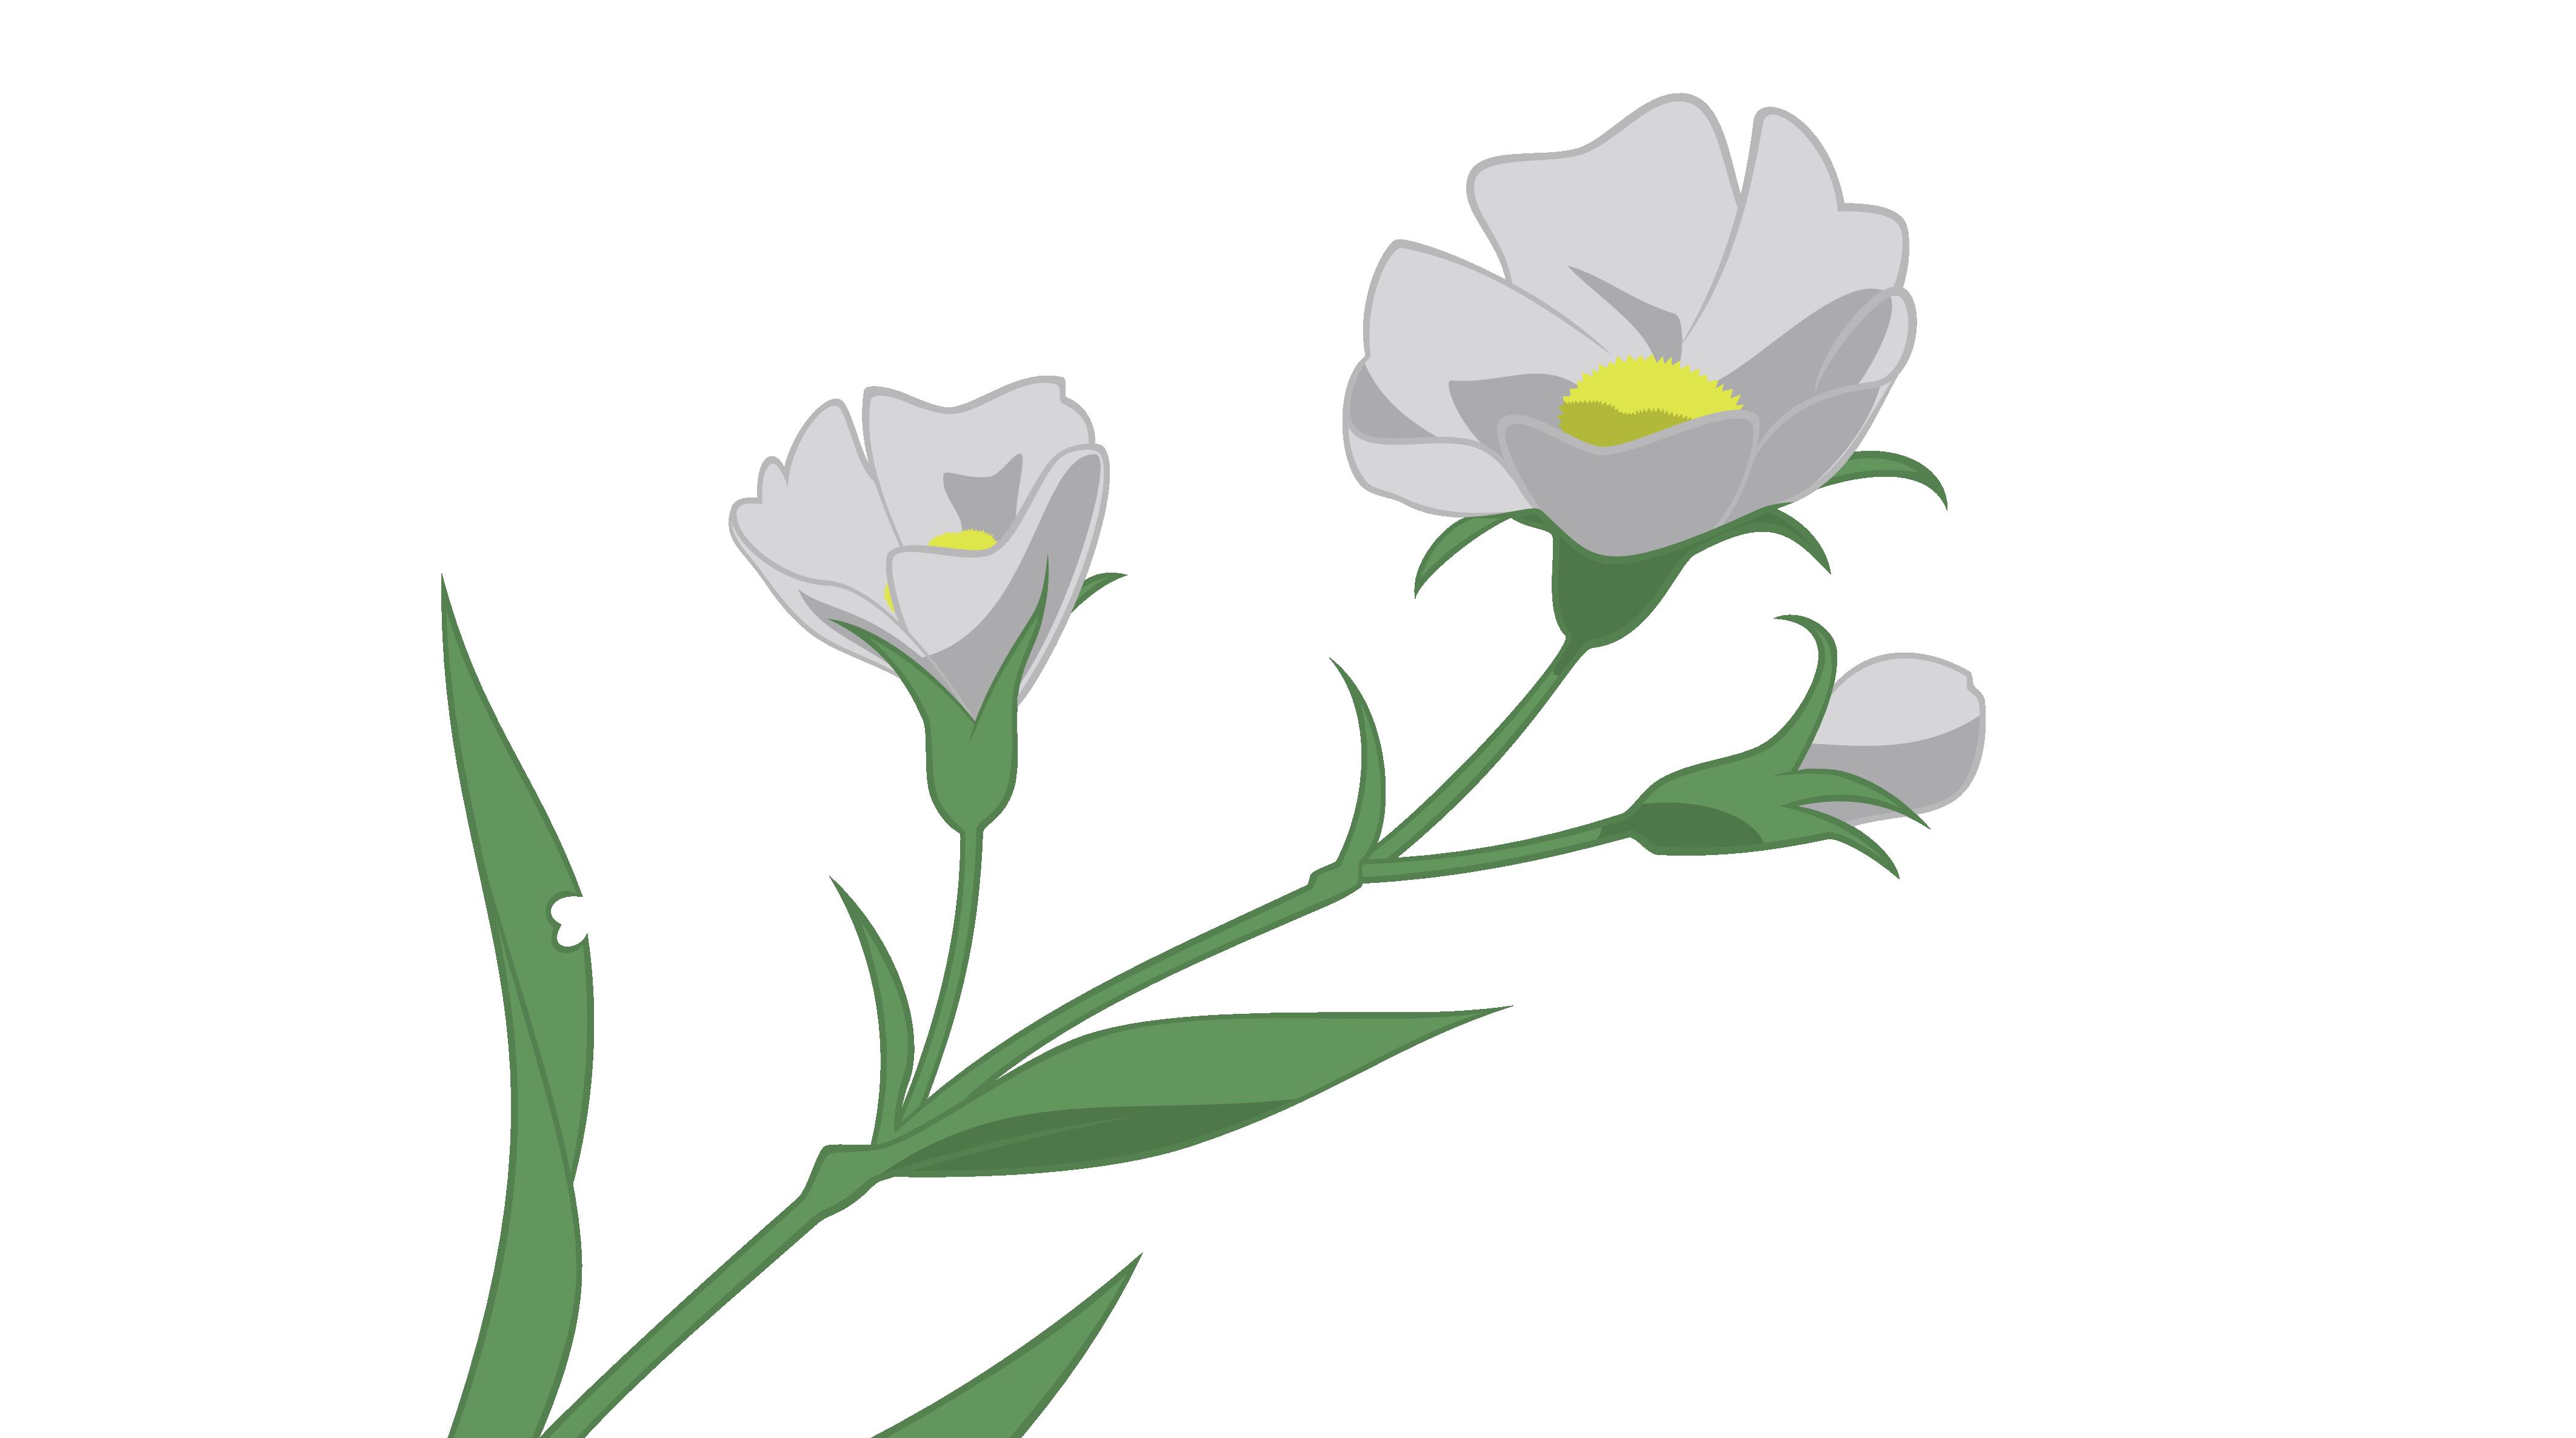 Desktop wallpaper animation transprent. Anime flower png